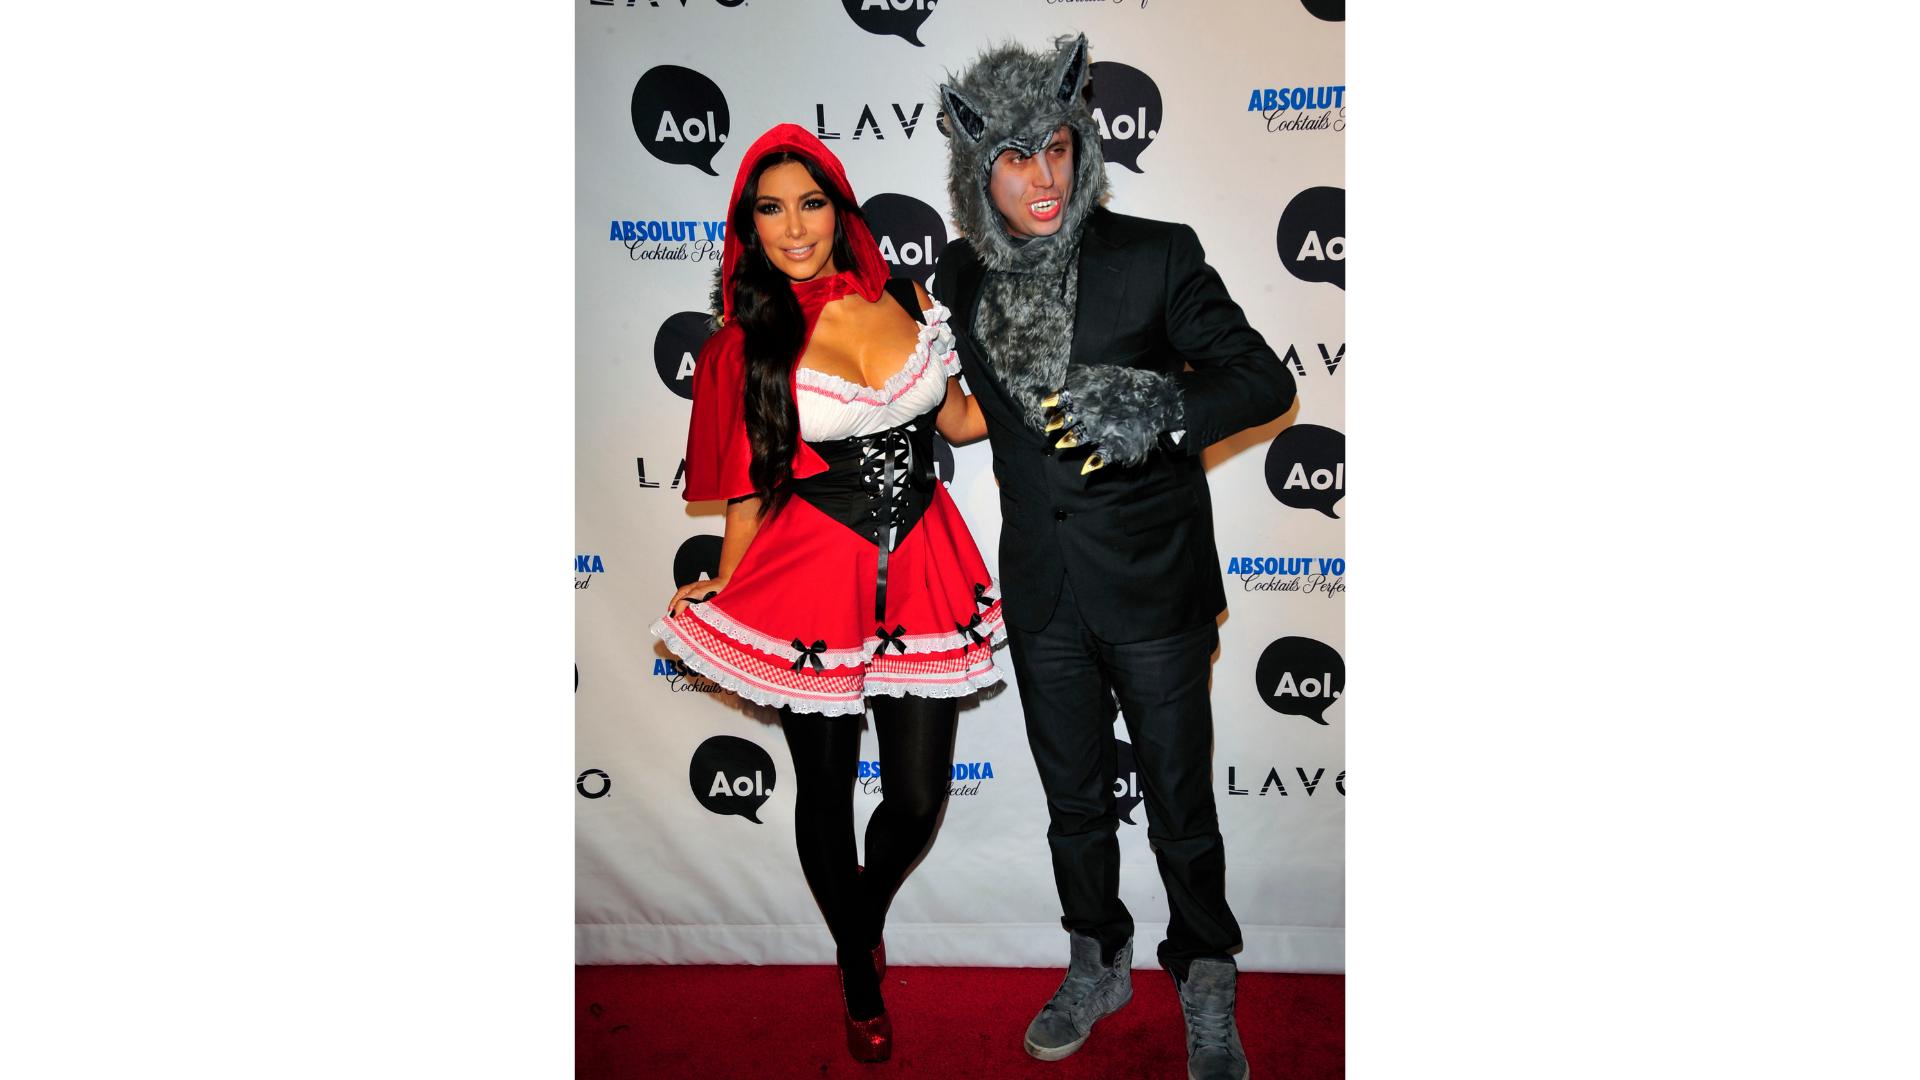 Kim Kardashian et son amie en petit chaperon rouge et loup.